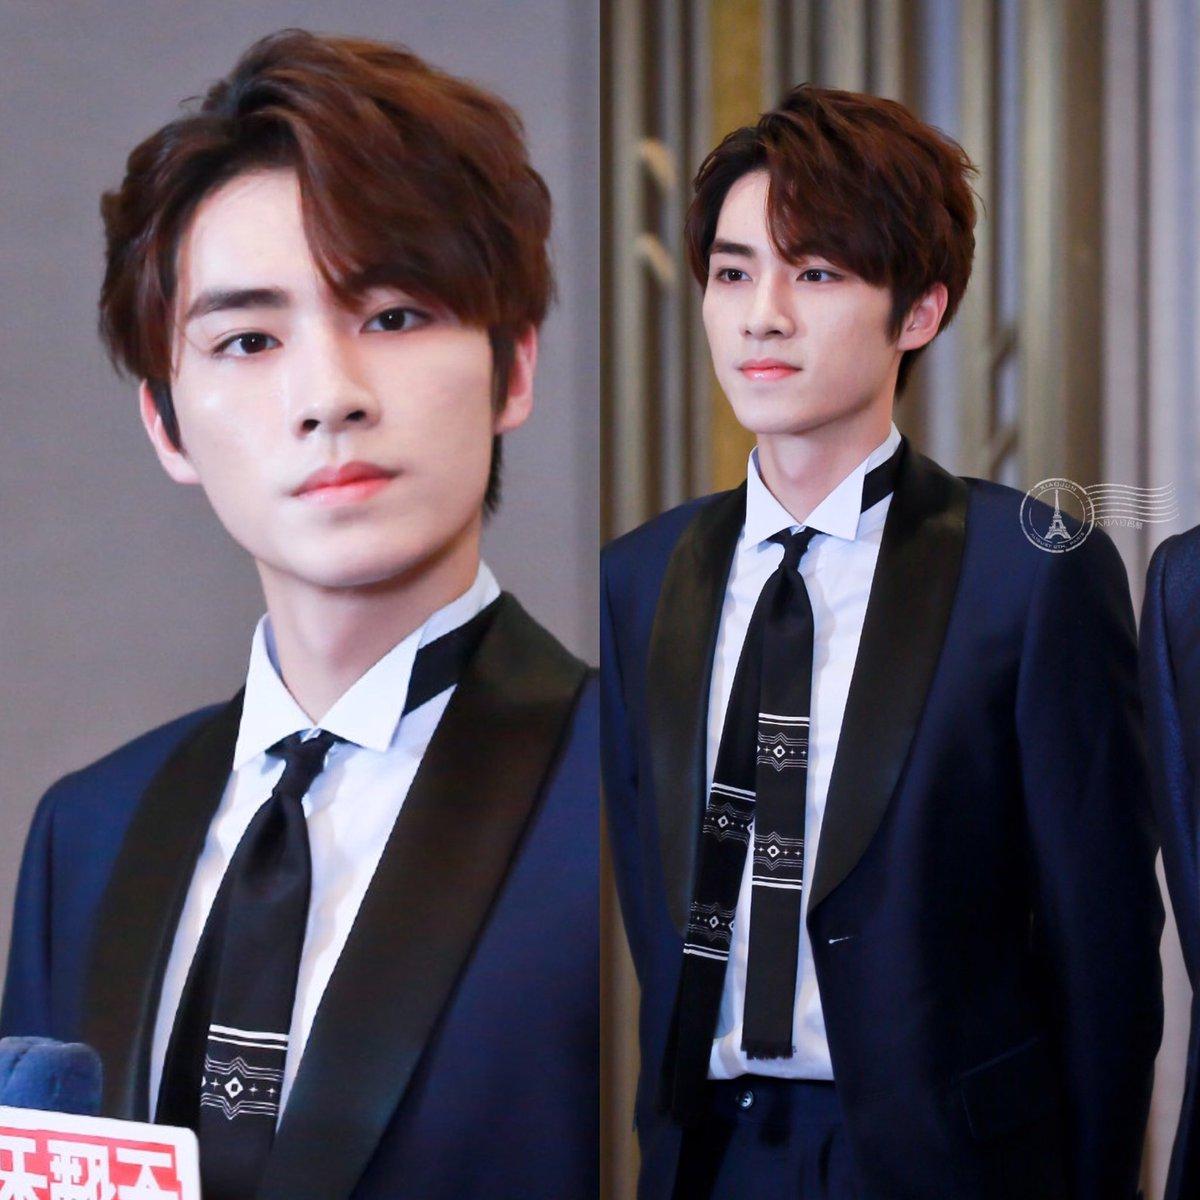 unseen xiaojun suit pics from the event!<br>http://pic.twitter.com/kkrLEtc96h